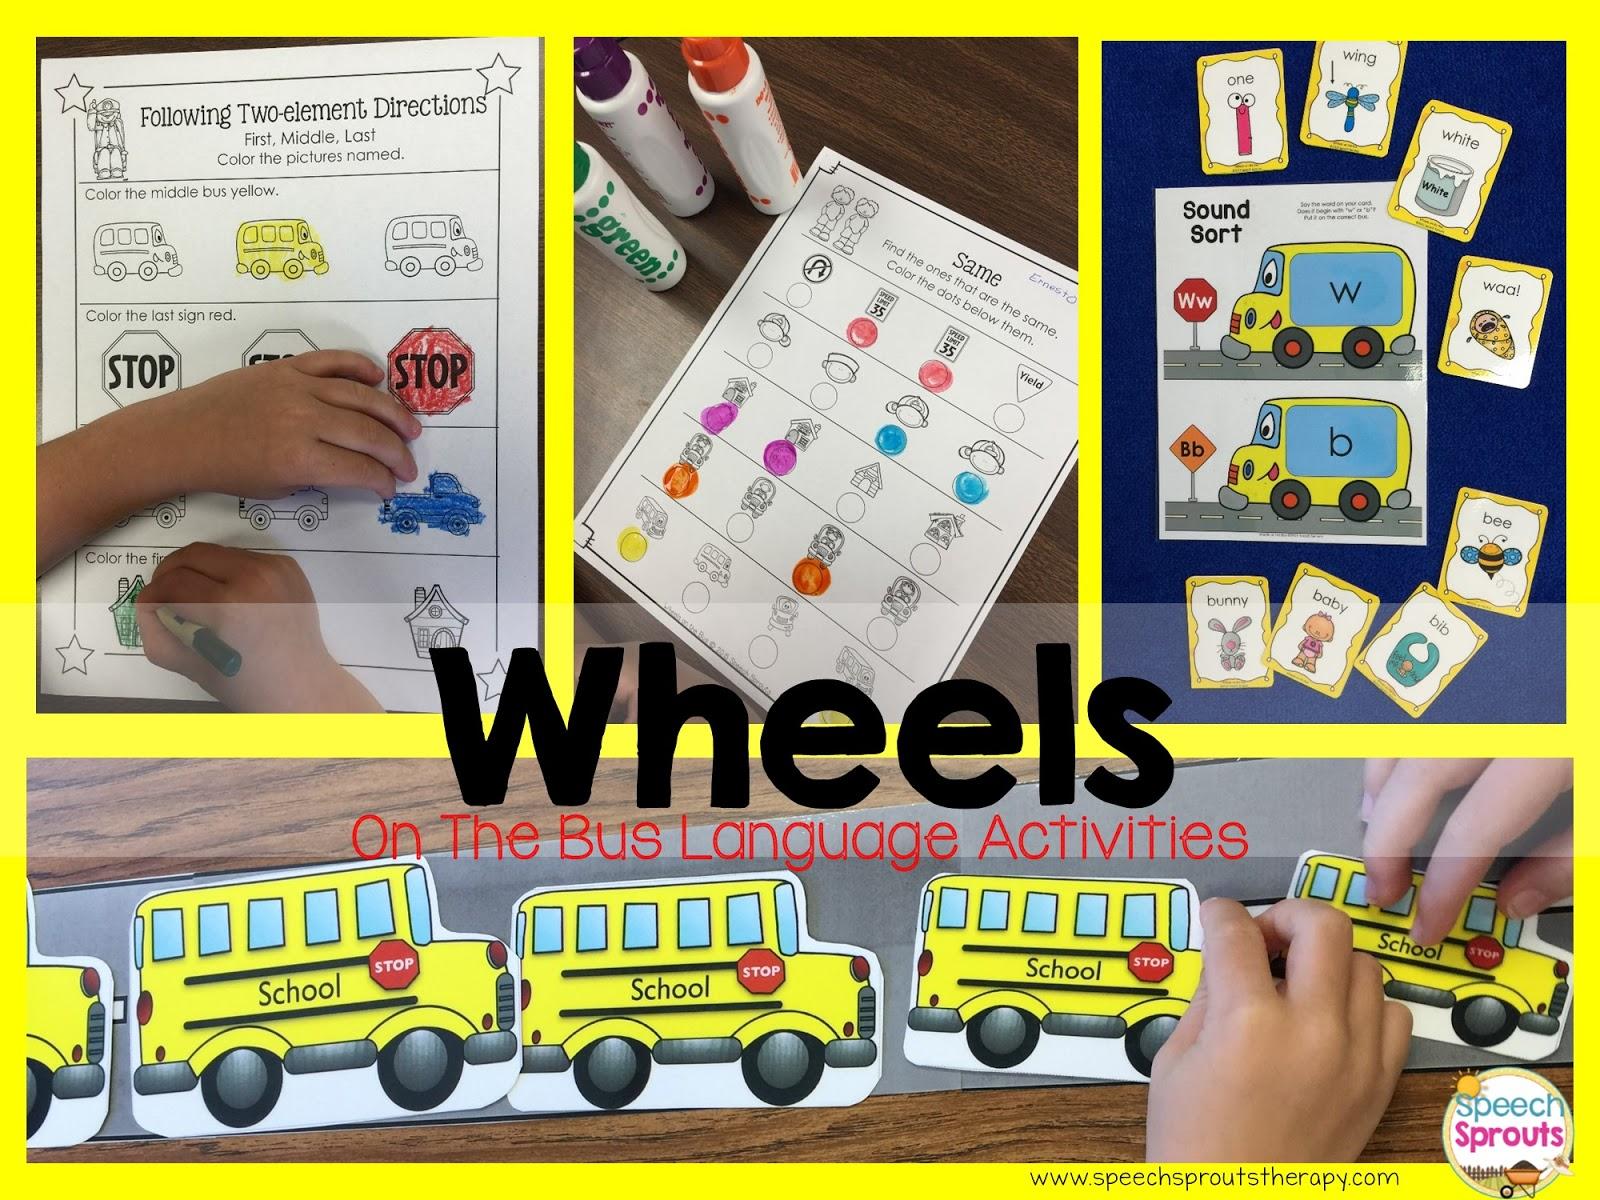 Speech Sprouts Wheels On The Bus Transportation Week